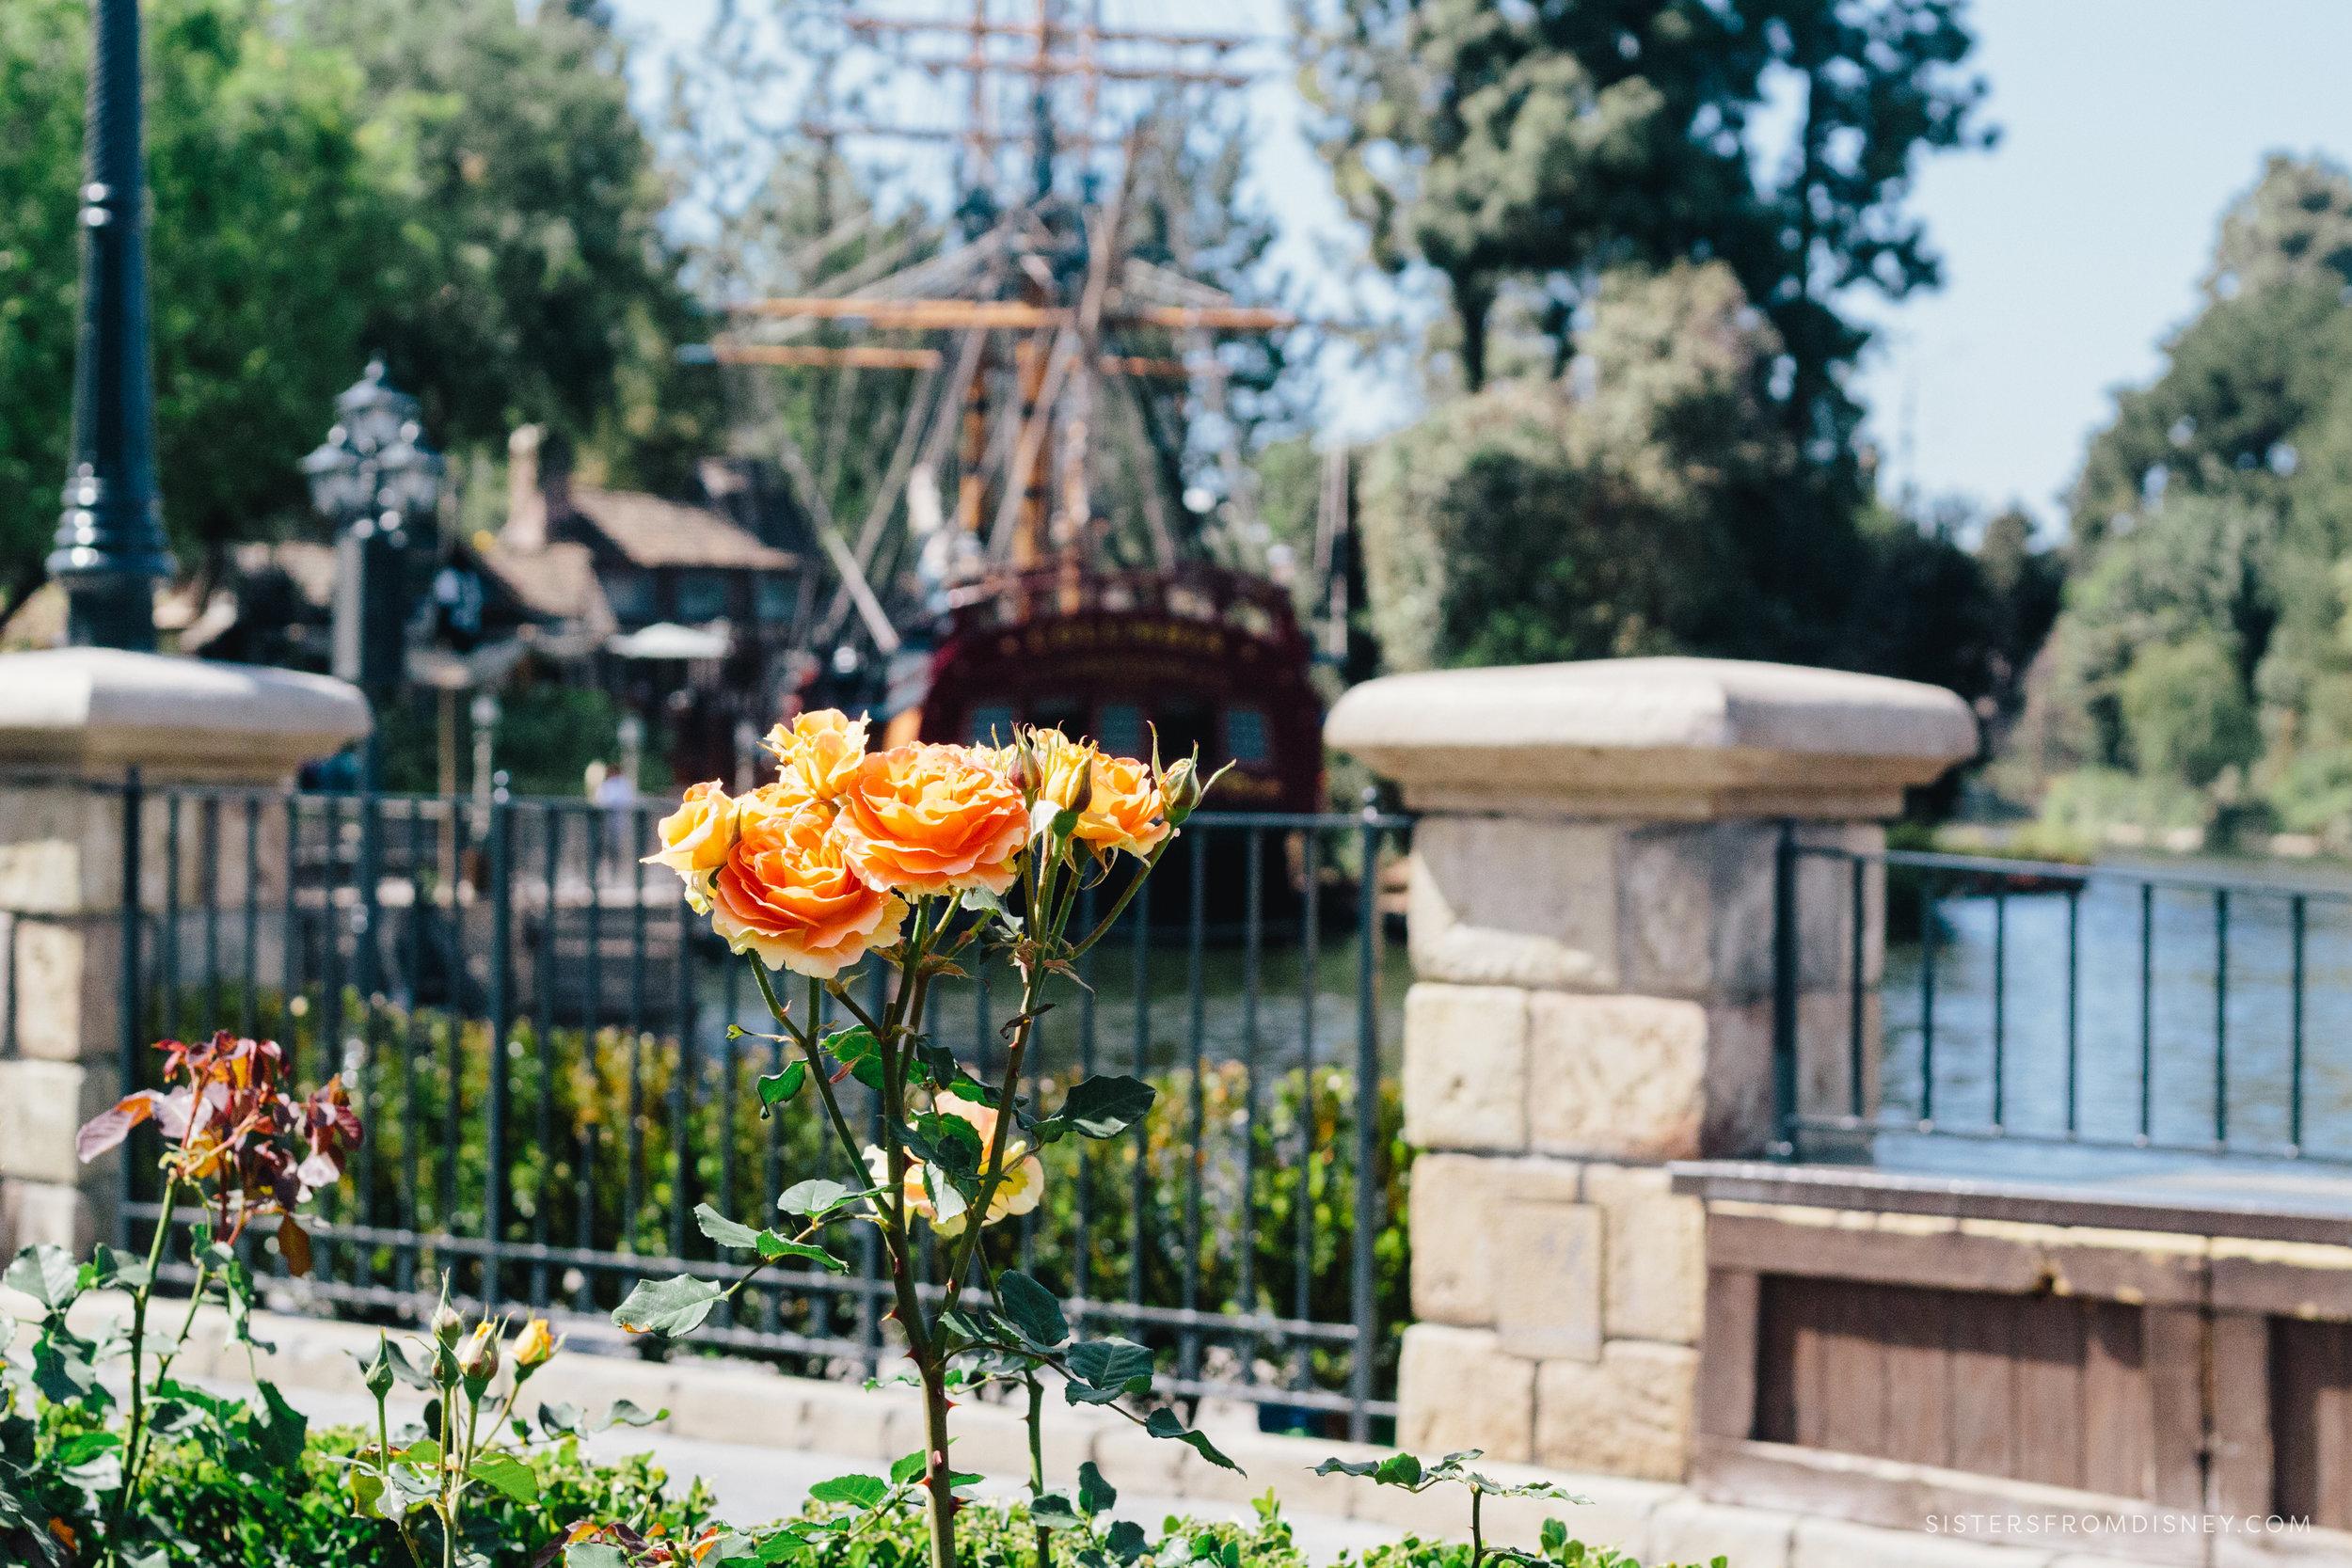 2018April_SFDblog_DisneylandApril_Jaycee_Watermark-2168.jpg